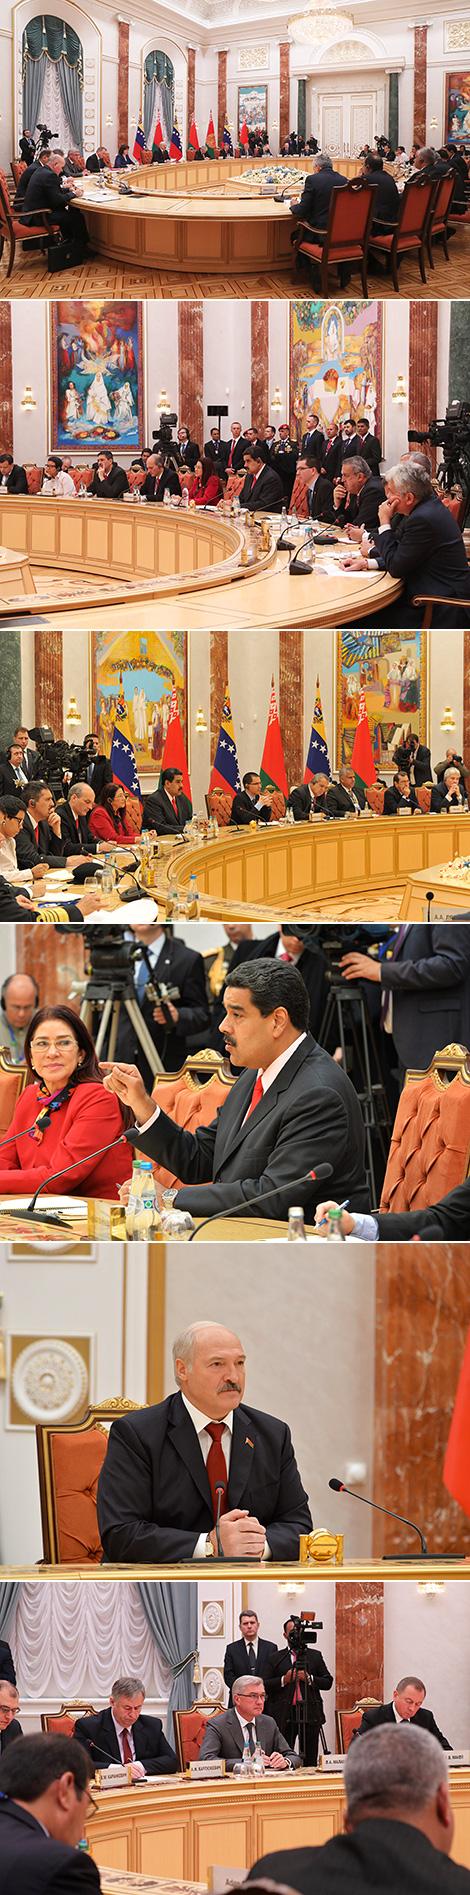 Extended negotiations with Venezuela President Nicolas Maduro